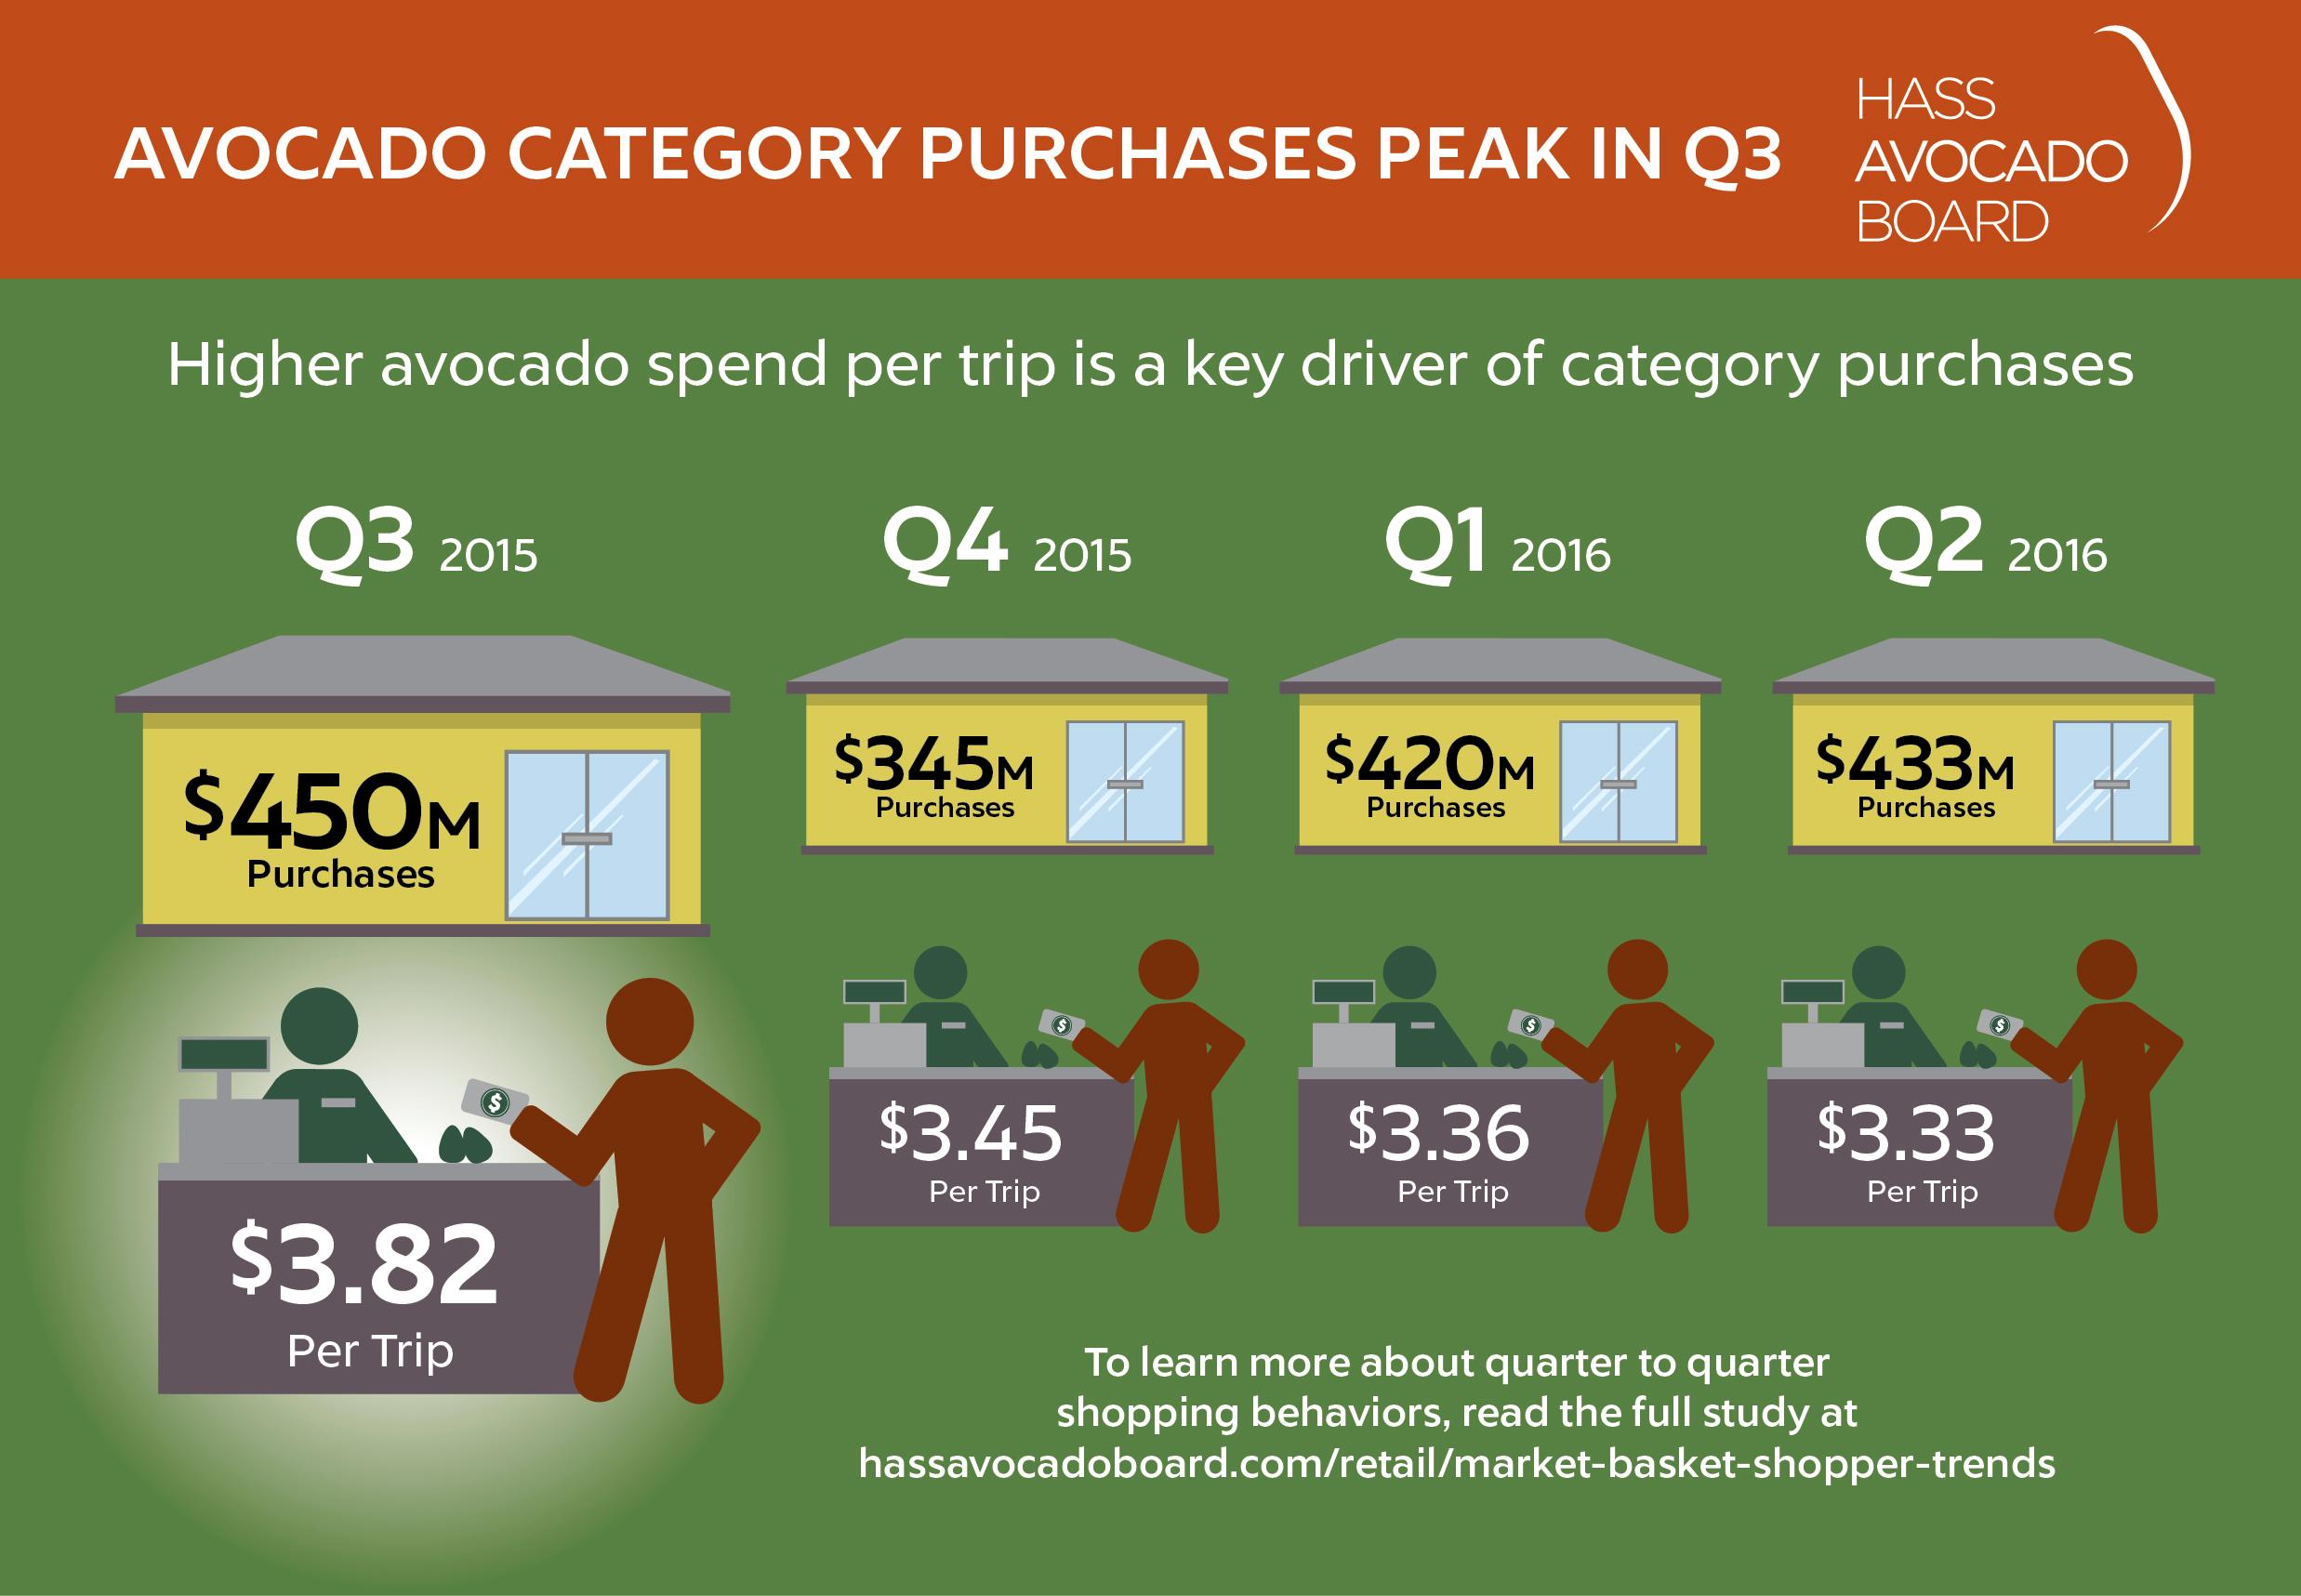 Q3 2015 $450M Purchases. Avocado spend per trip peaks in Q3